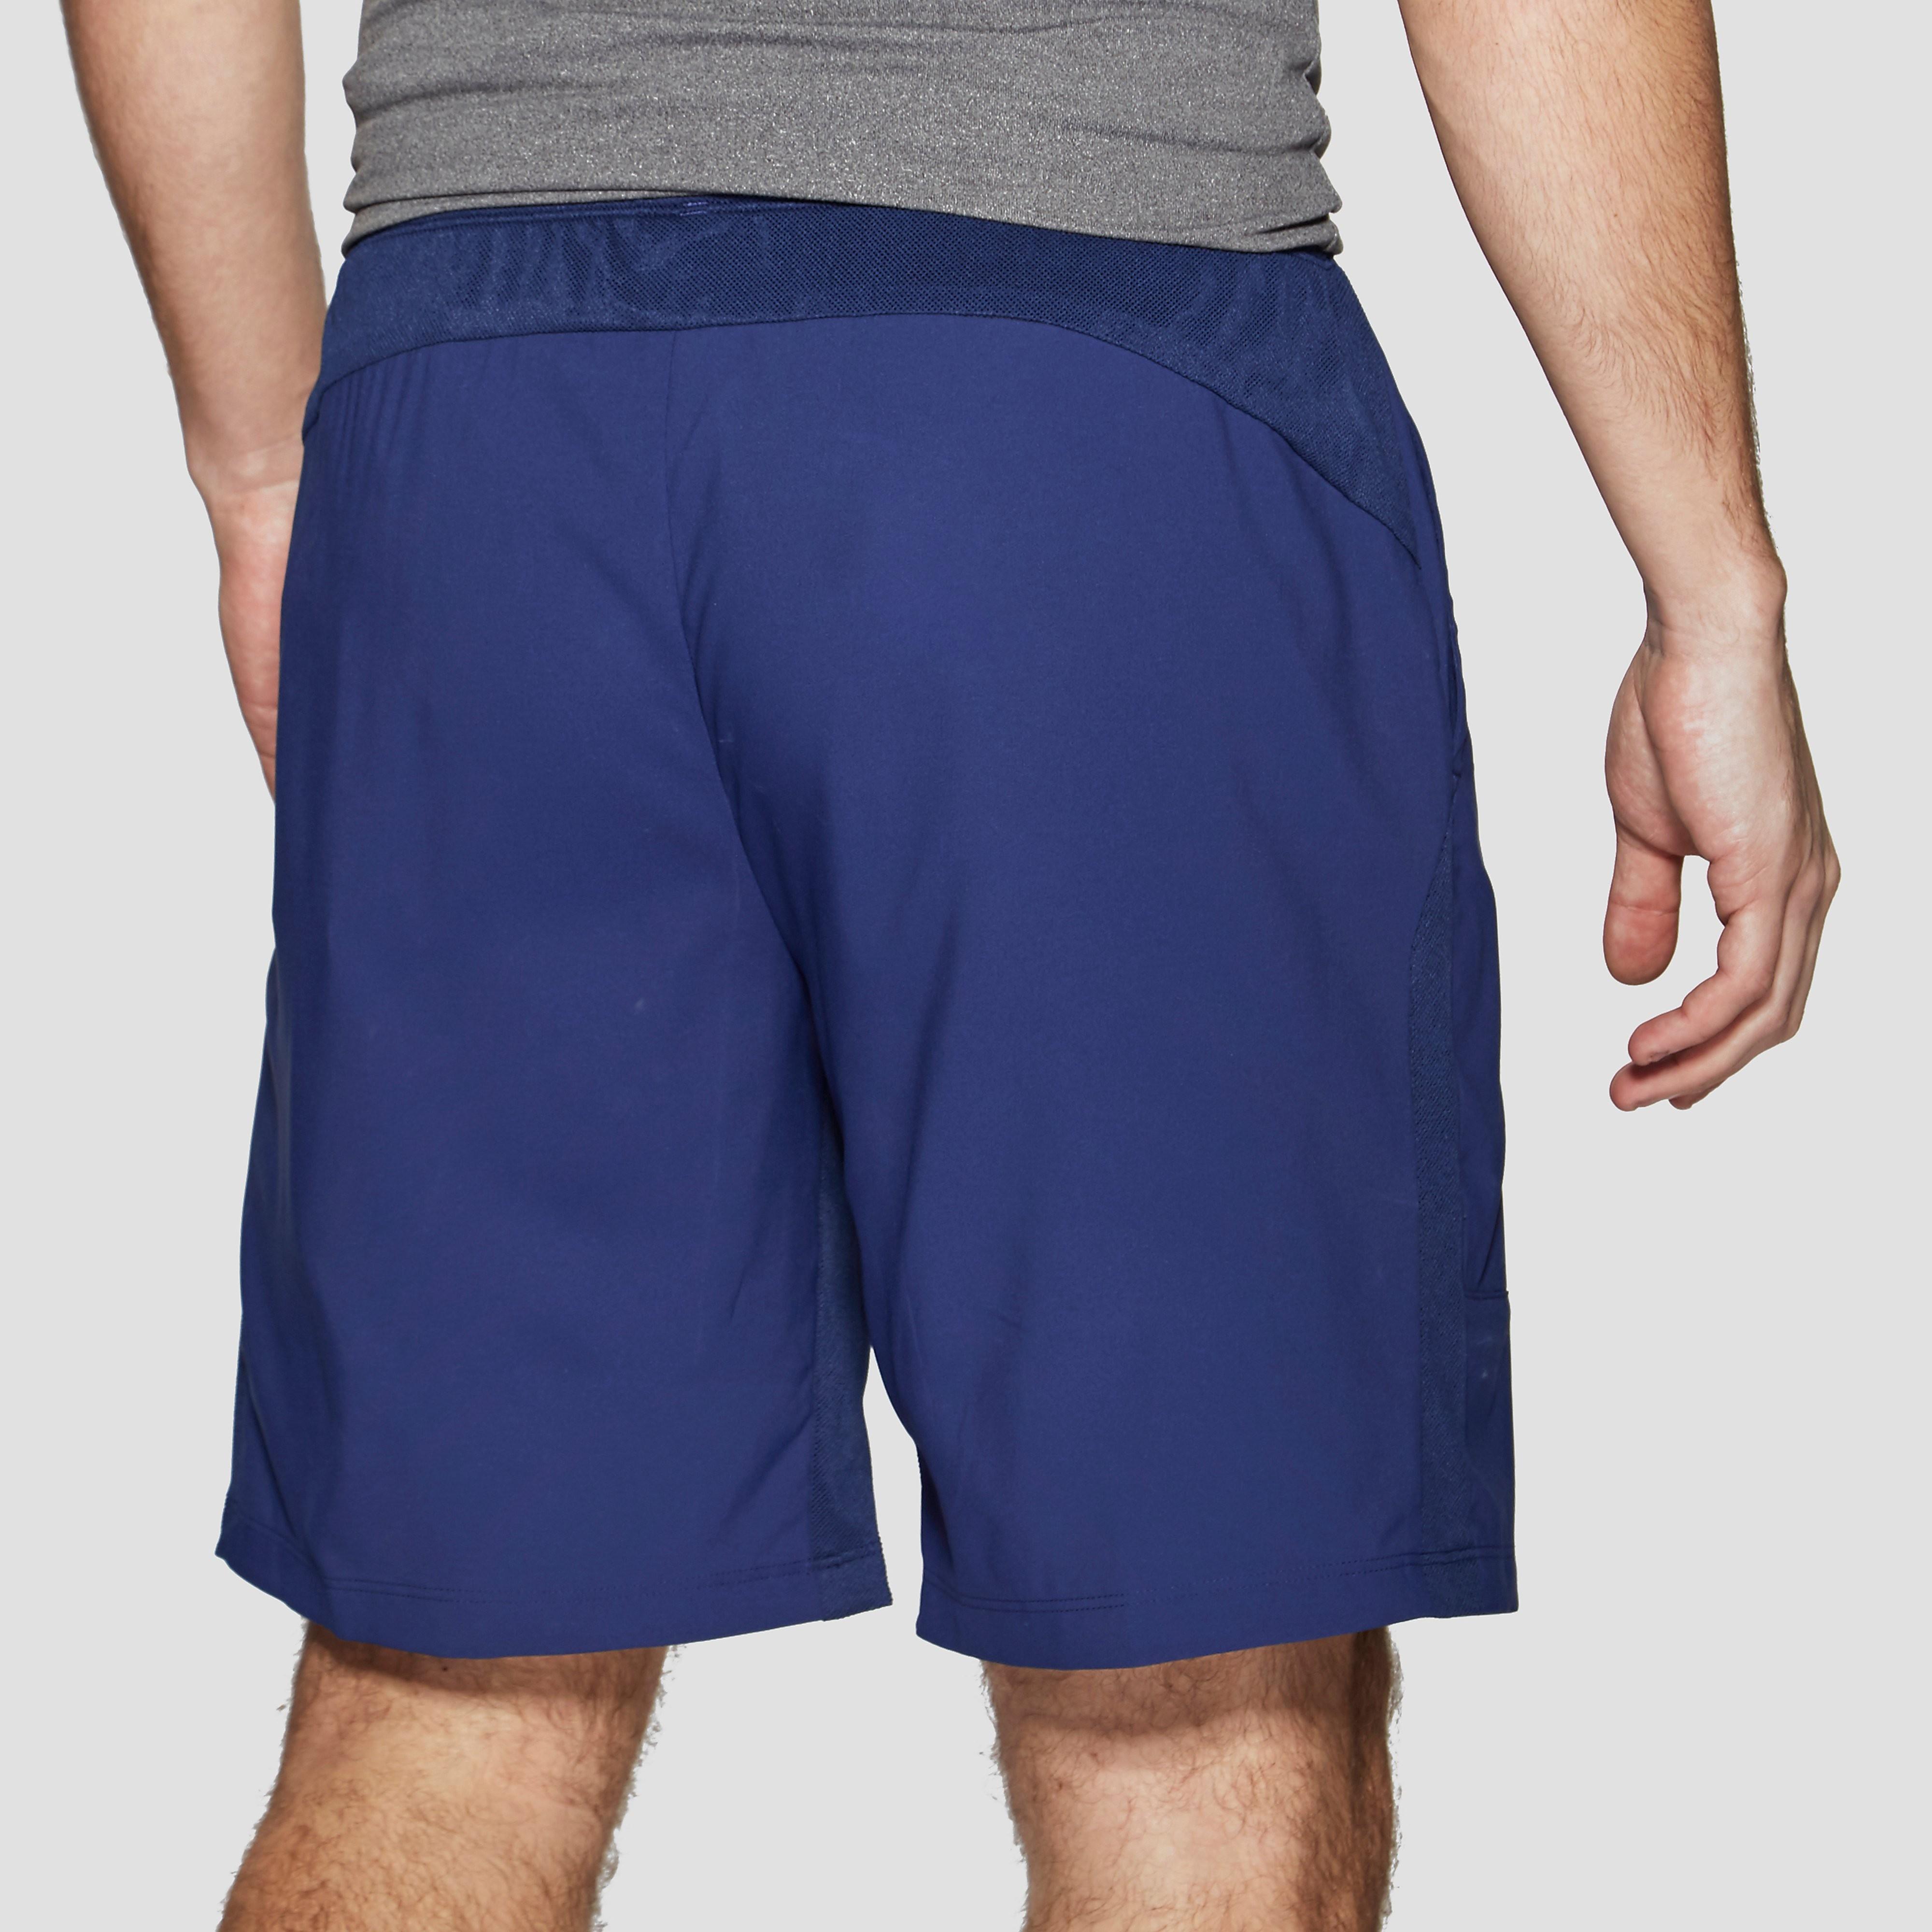 ASICS Men's Club Woven 7 Inch Tennis Shorts